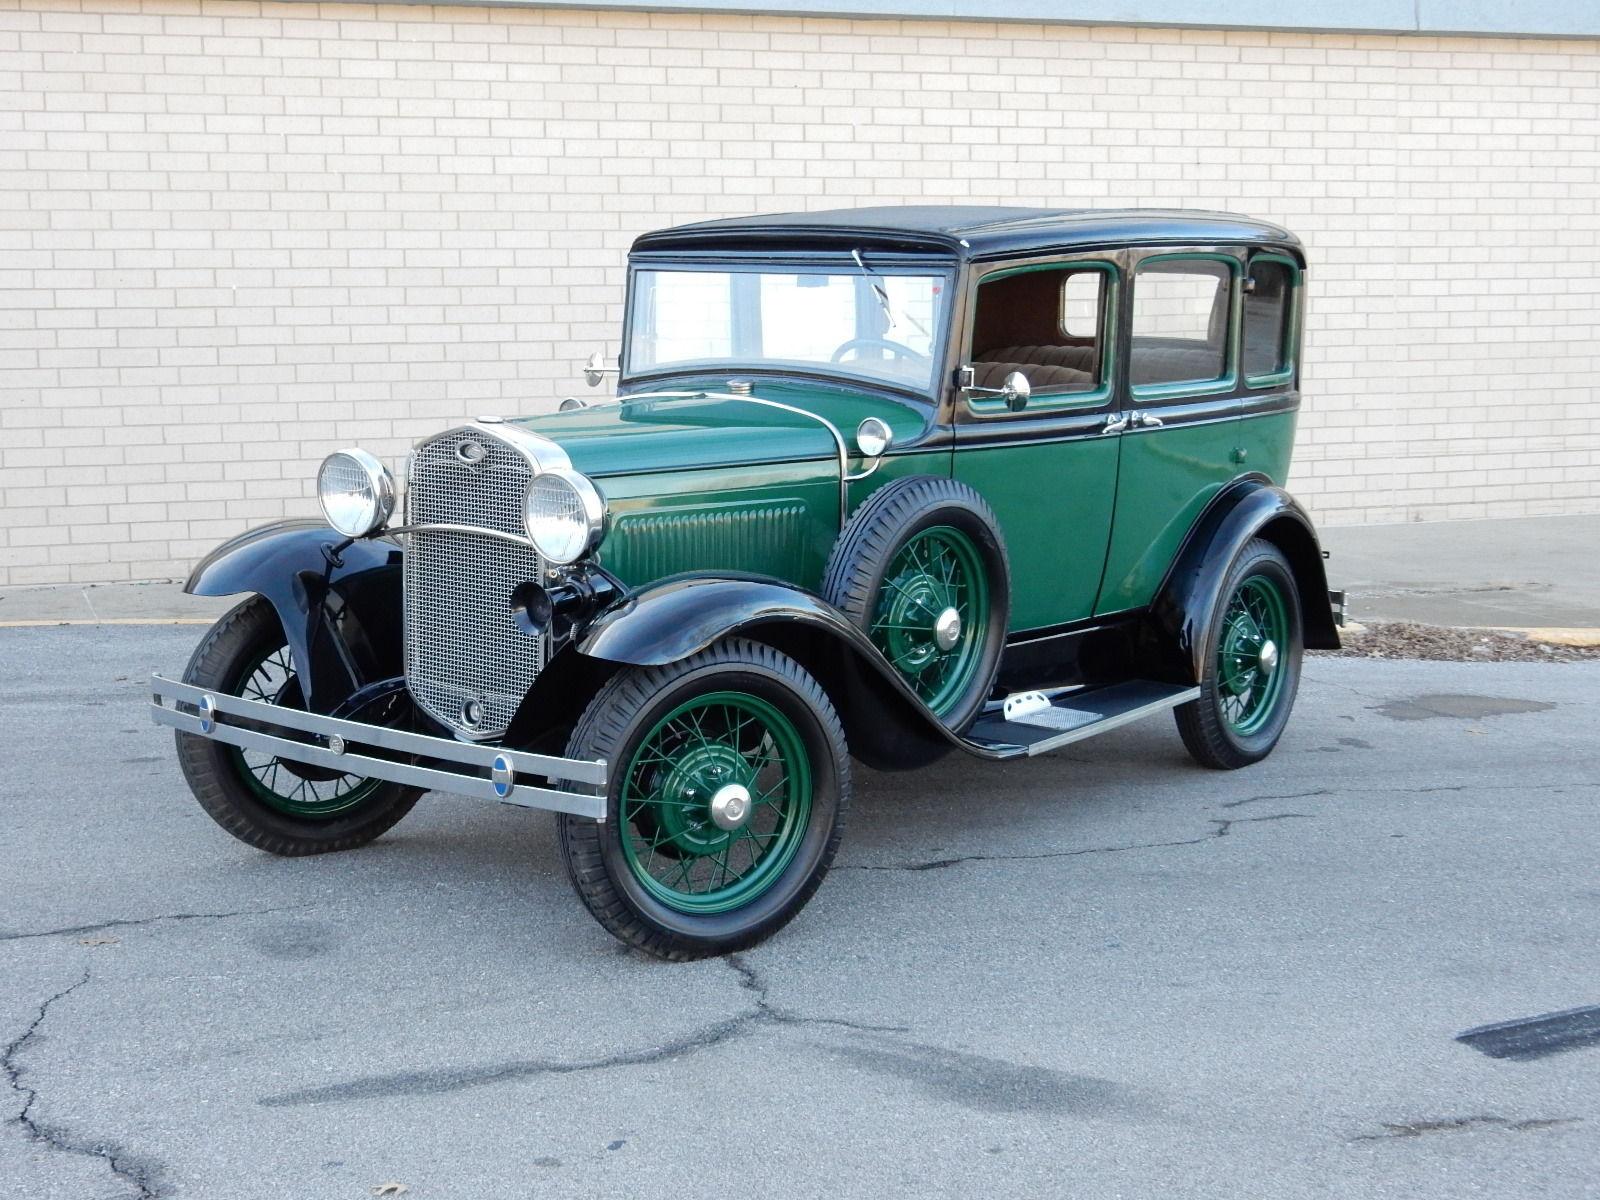 beautiful 1931 ford model a slant windshied 6 window sedan very rare classic ford model a. Black Bedroom Furniture Sets. Home Design Ideas